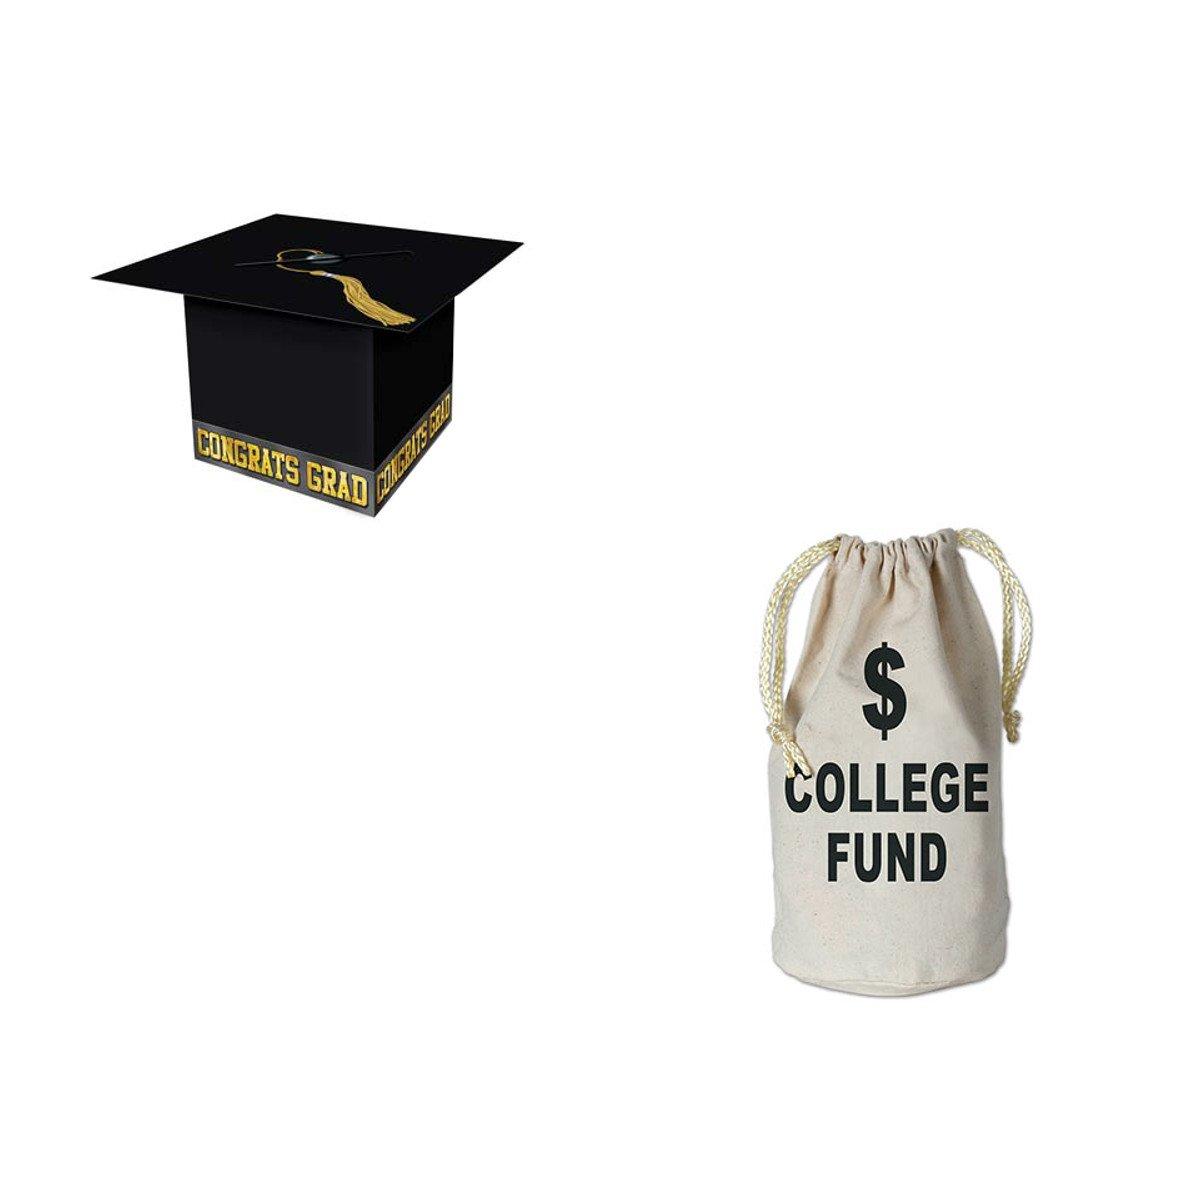 WGI Graduation Party 8.5'' x 8.5'' Decor Grad Cap Card Box/Small College Fund Money Bag by WeGlow International